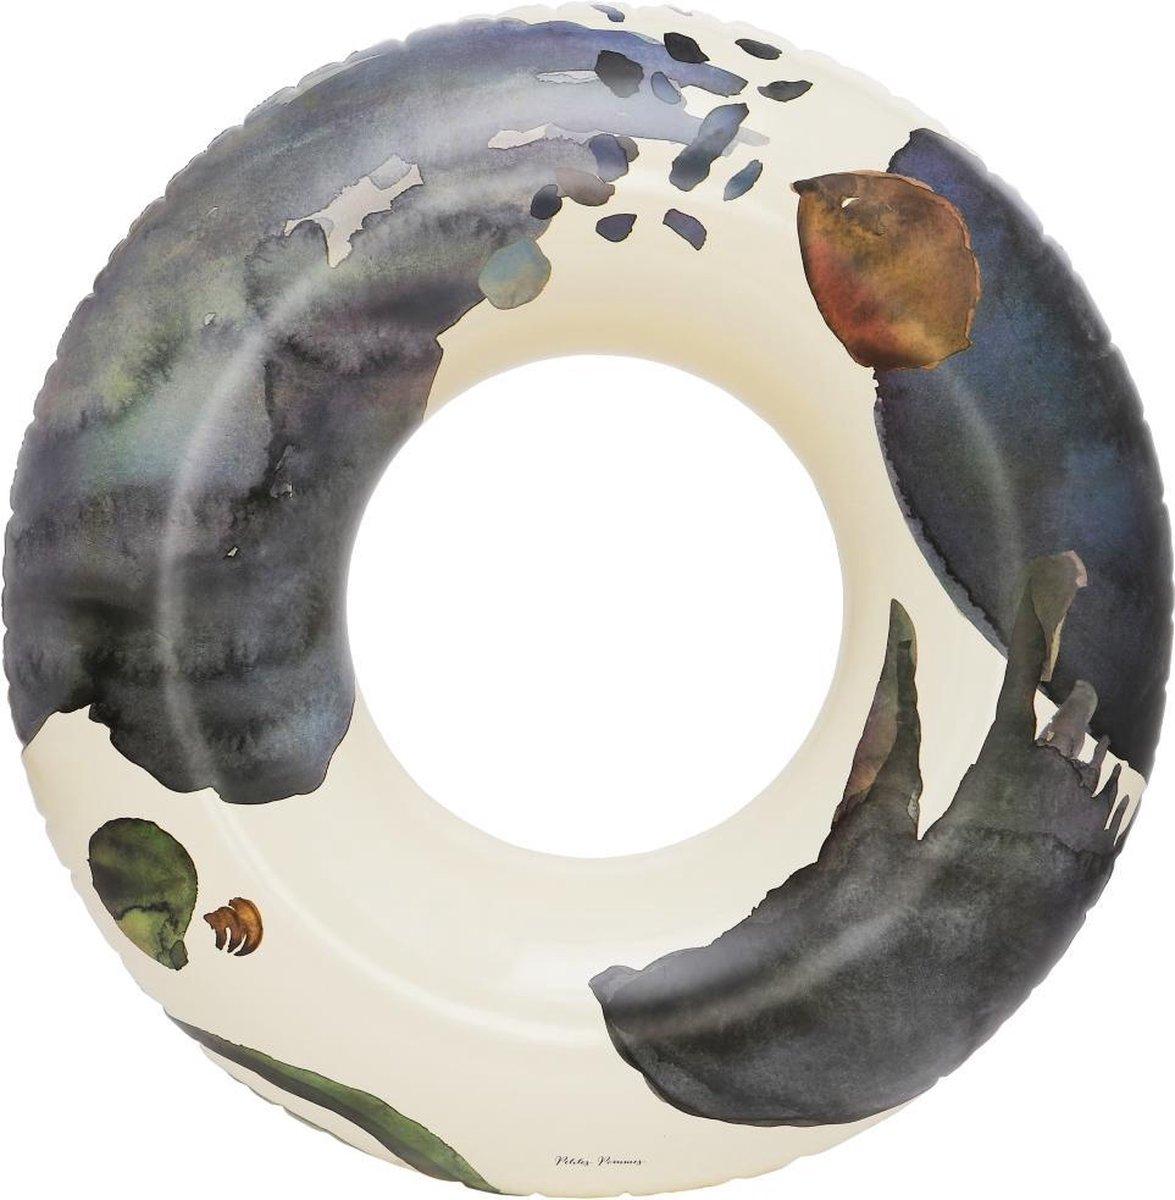 Petites Pommes Zwemring Celine Grand Float Seawater - Zwemband - ø 120cm - 6+ jaar